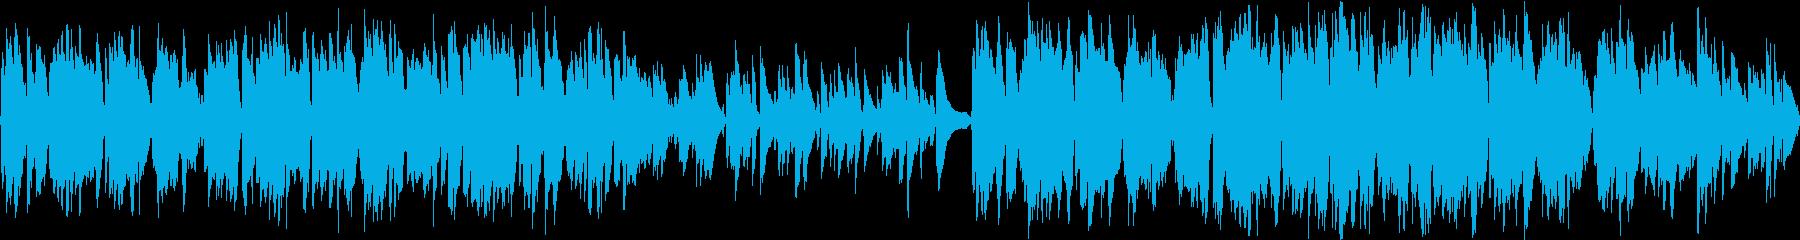 RPGの村で流れるケルト音楽・ループ版の再生済みの波形